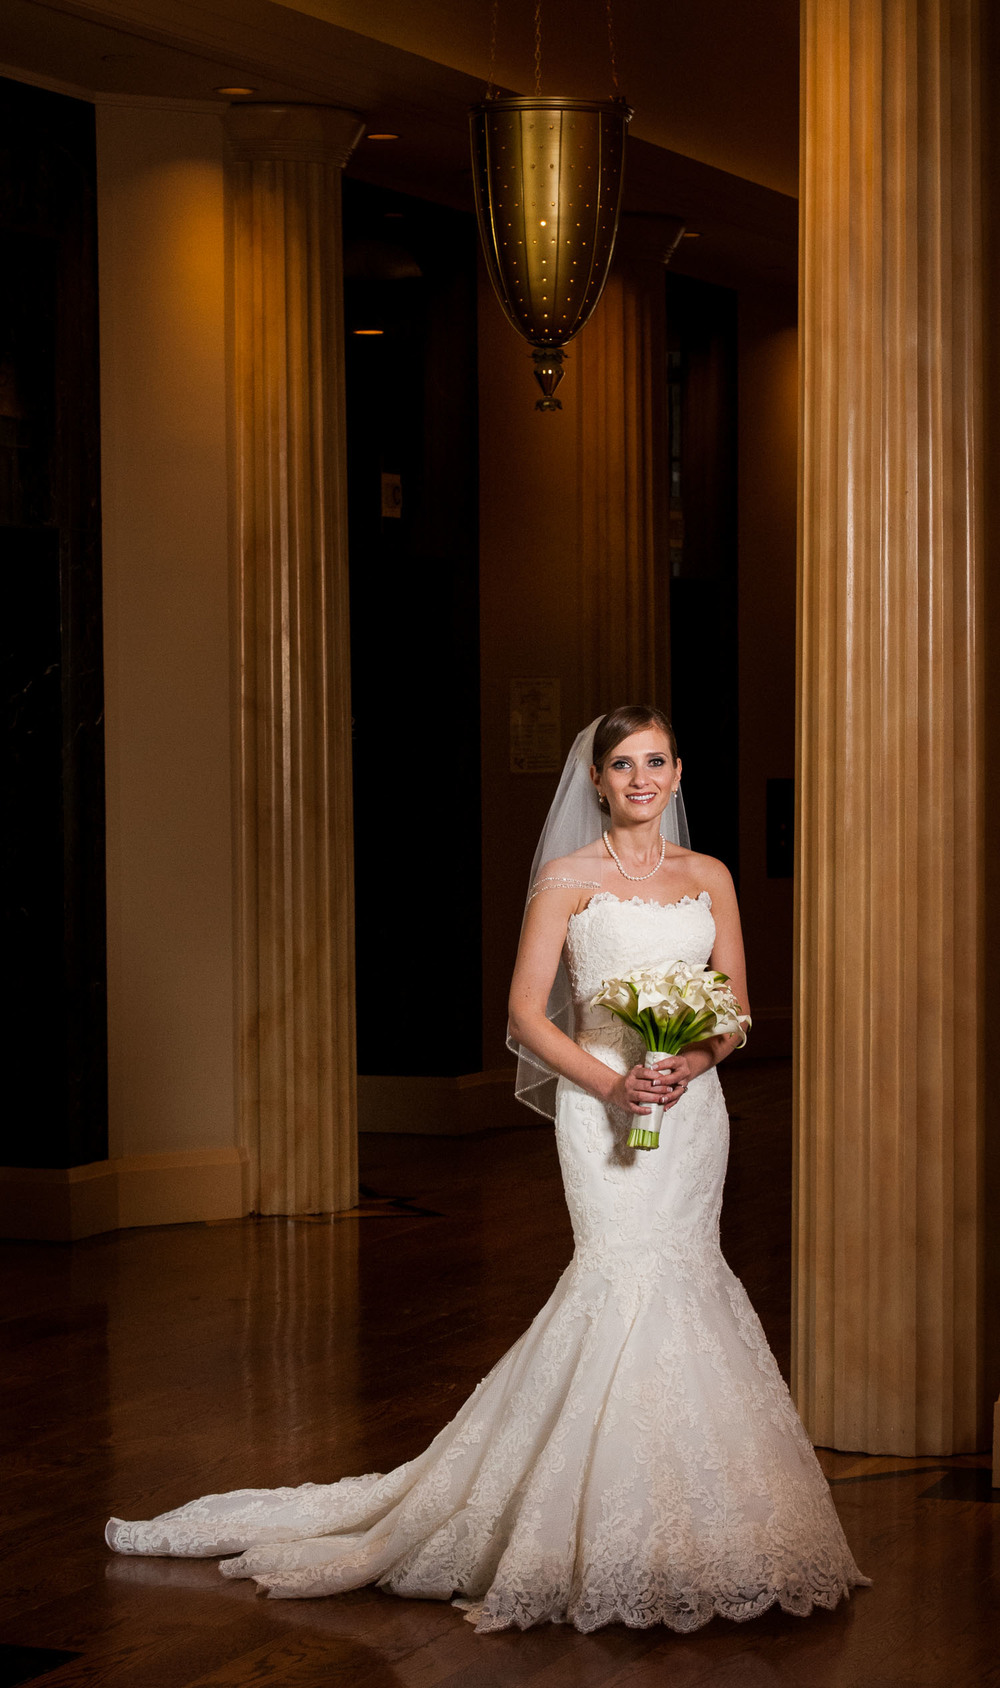 stewart_bertrand_wedding_photography_sp-1050.jpg